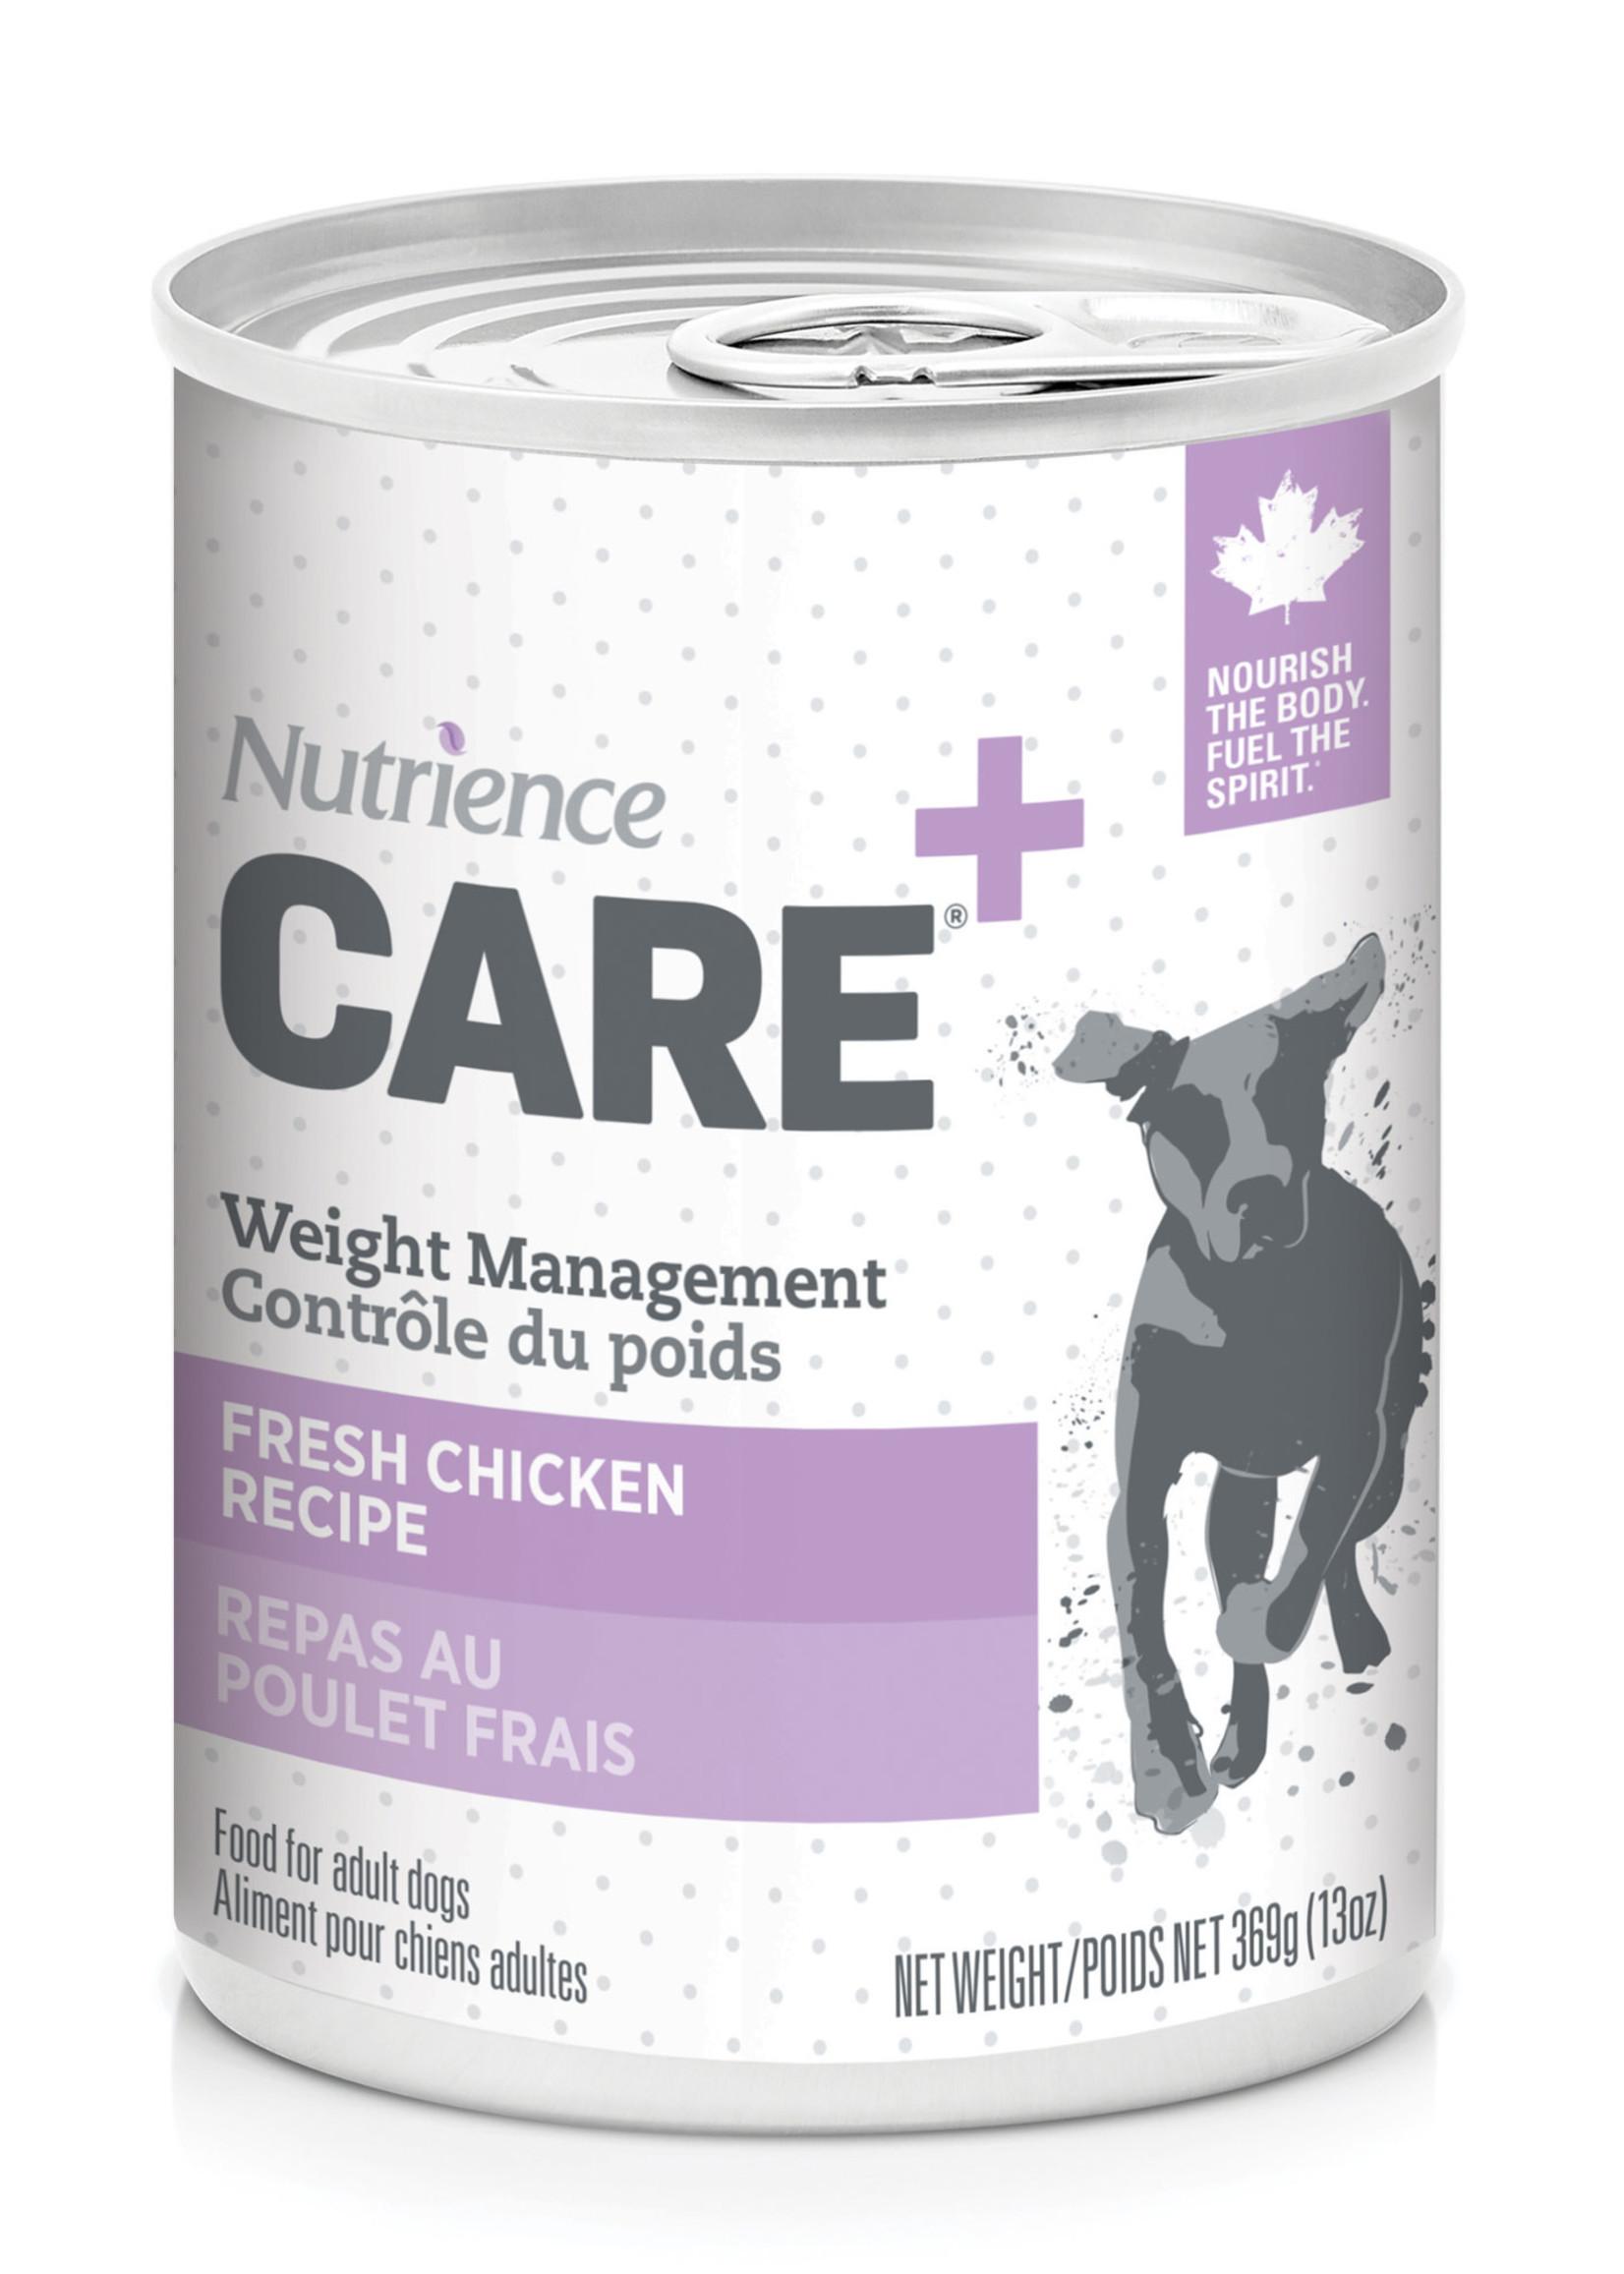 Nutrience Care Dog Weight Management - Chicken - 369g